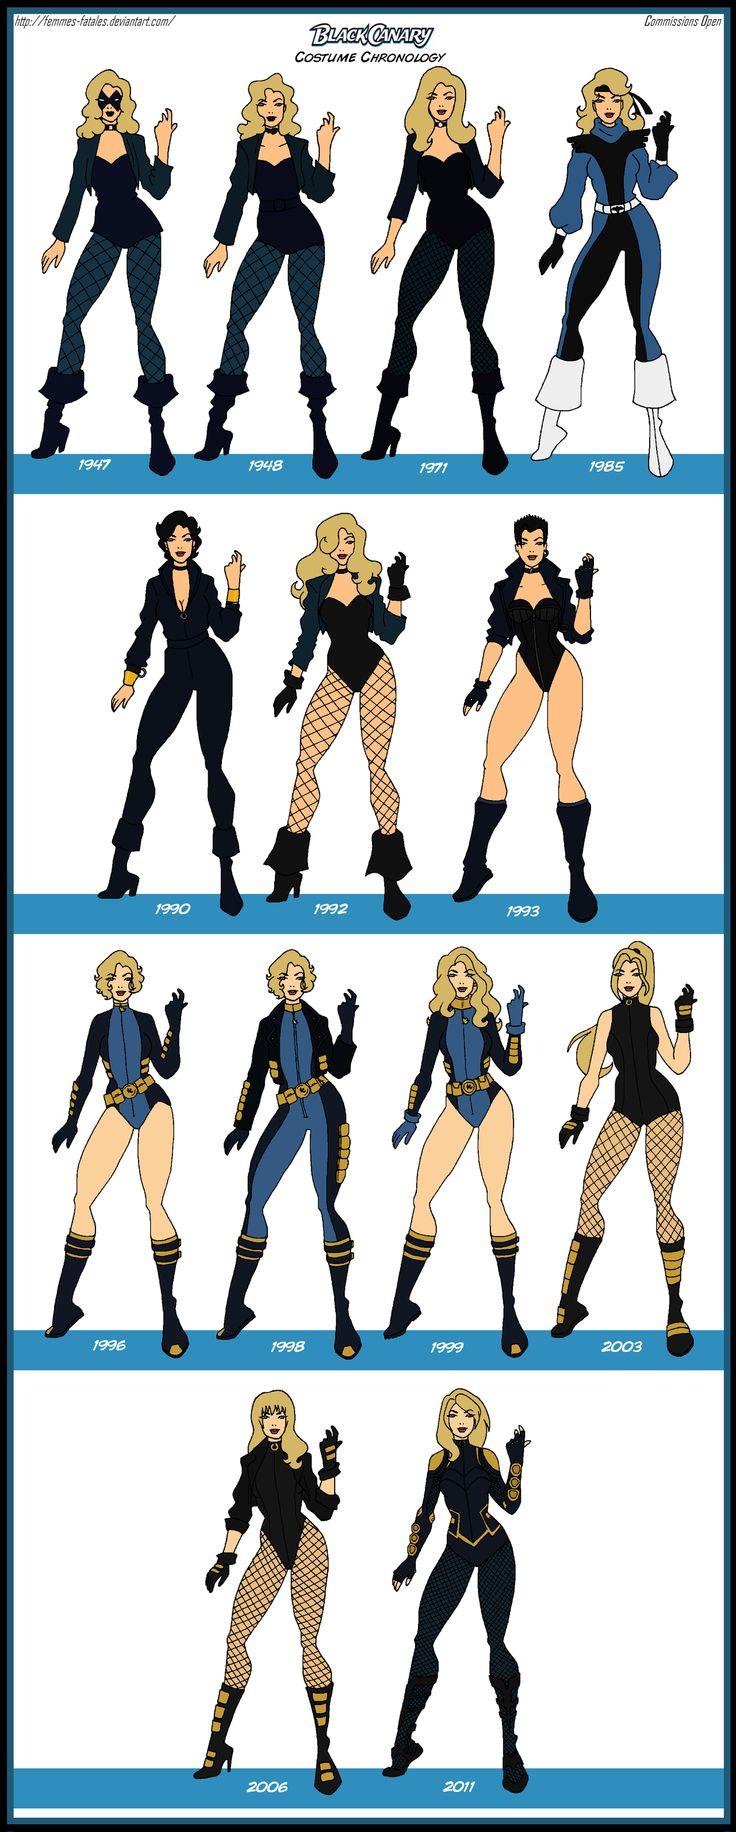 Black Canary Costume Chronology by Femmes-Fatales.deviantart.com on @DeviantArt